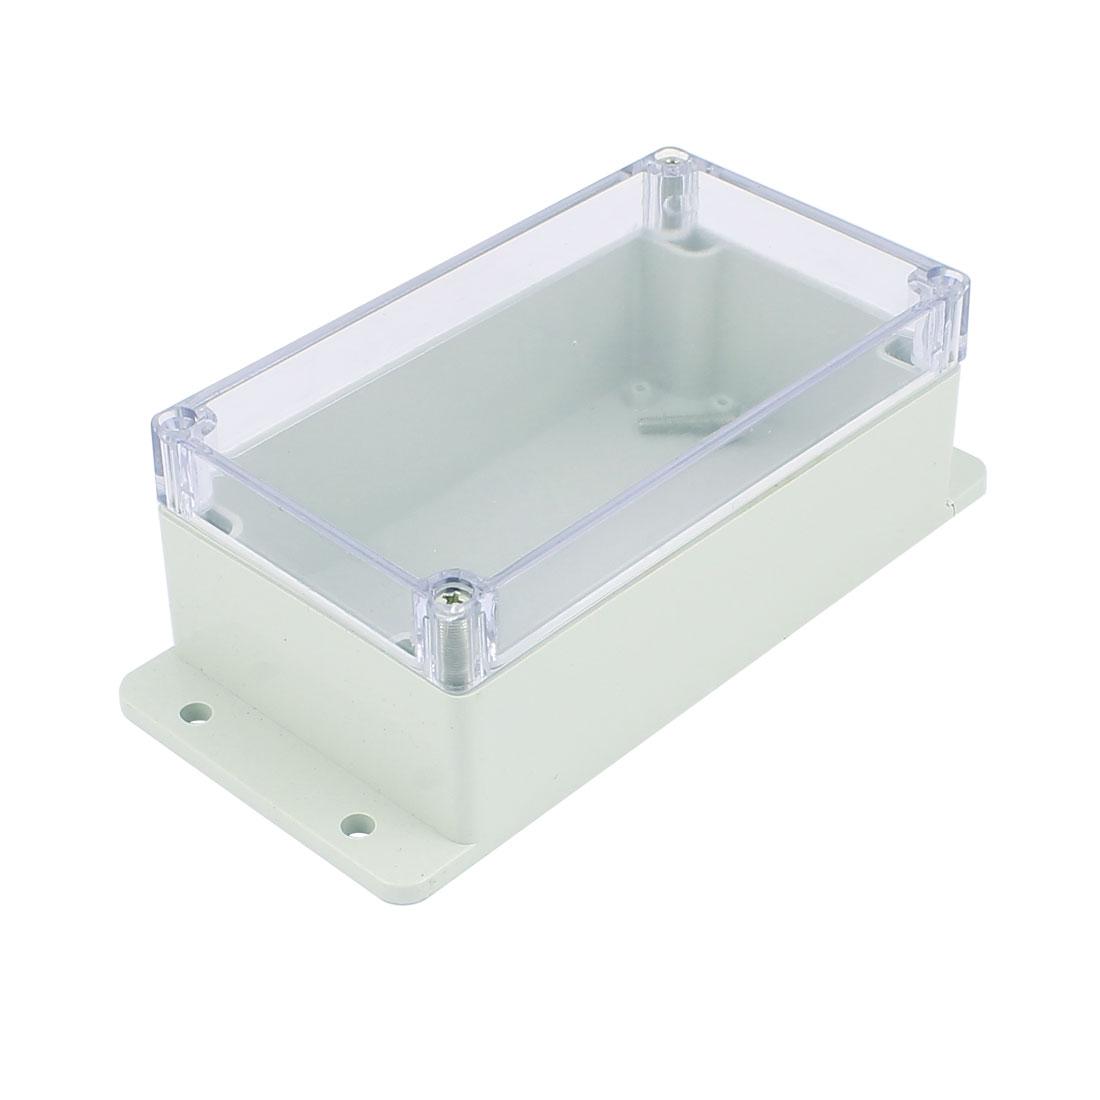 Dustproof IP65 Junction Box Case Terminal Connection Enclosure Adaptable 150mm x 82mm x 56mm